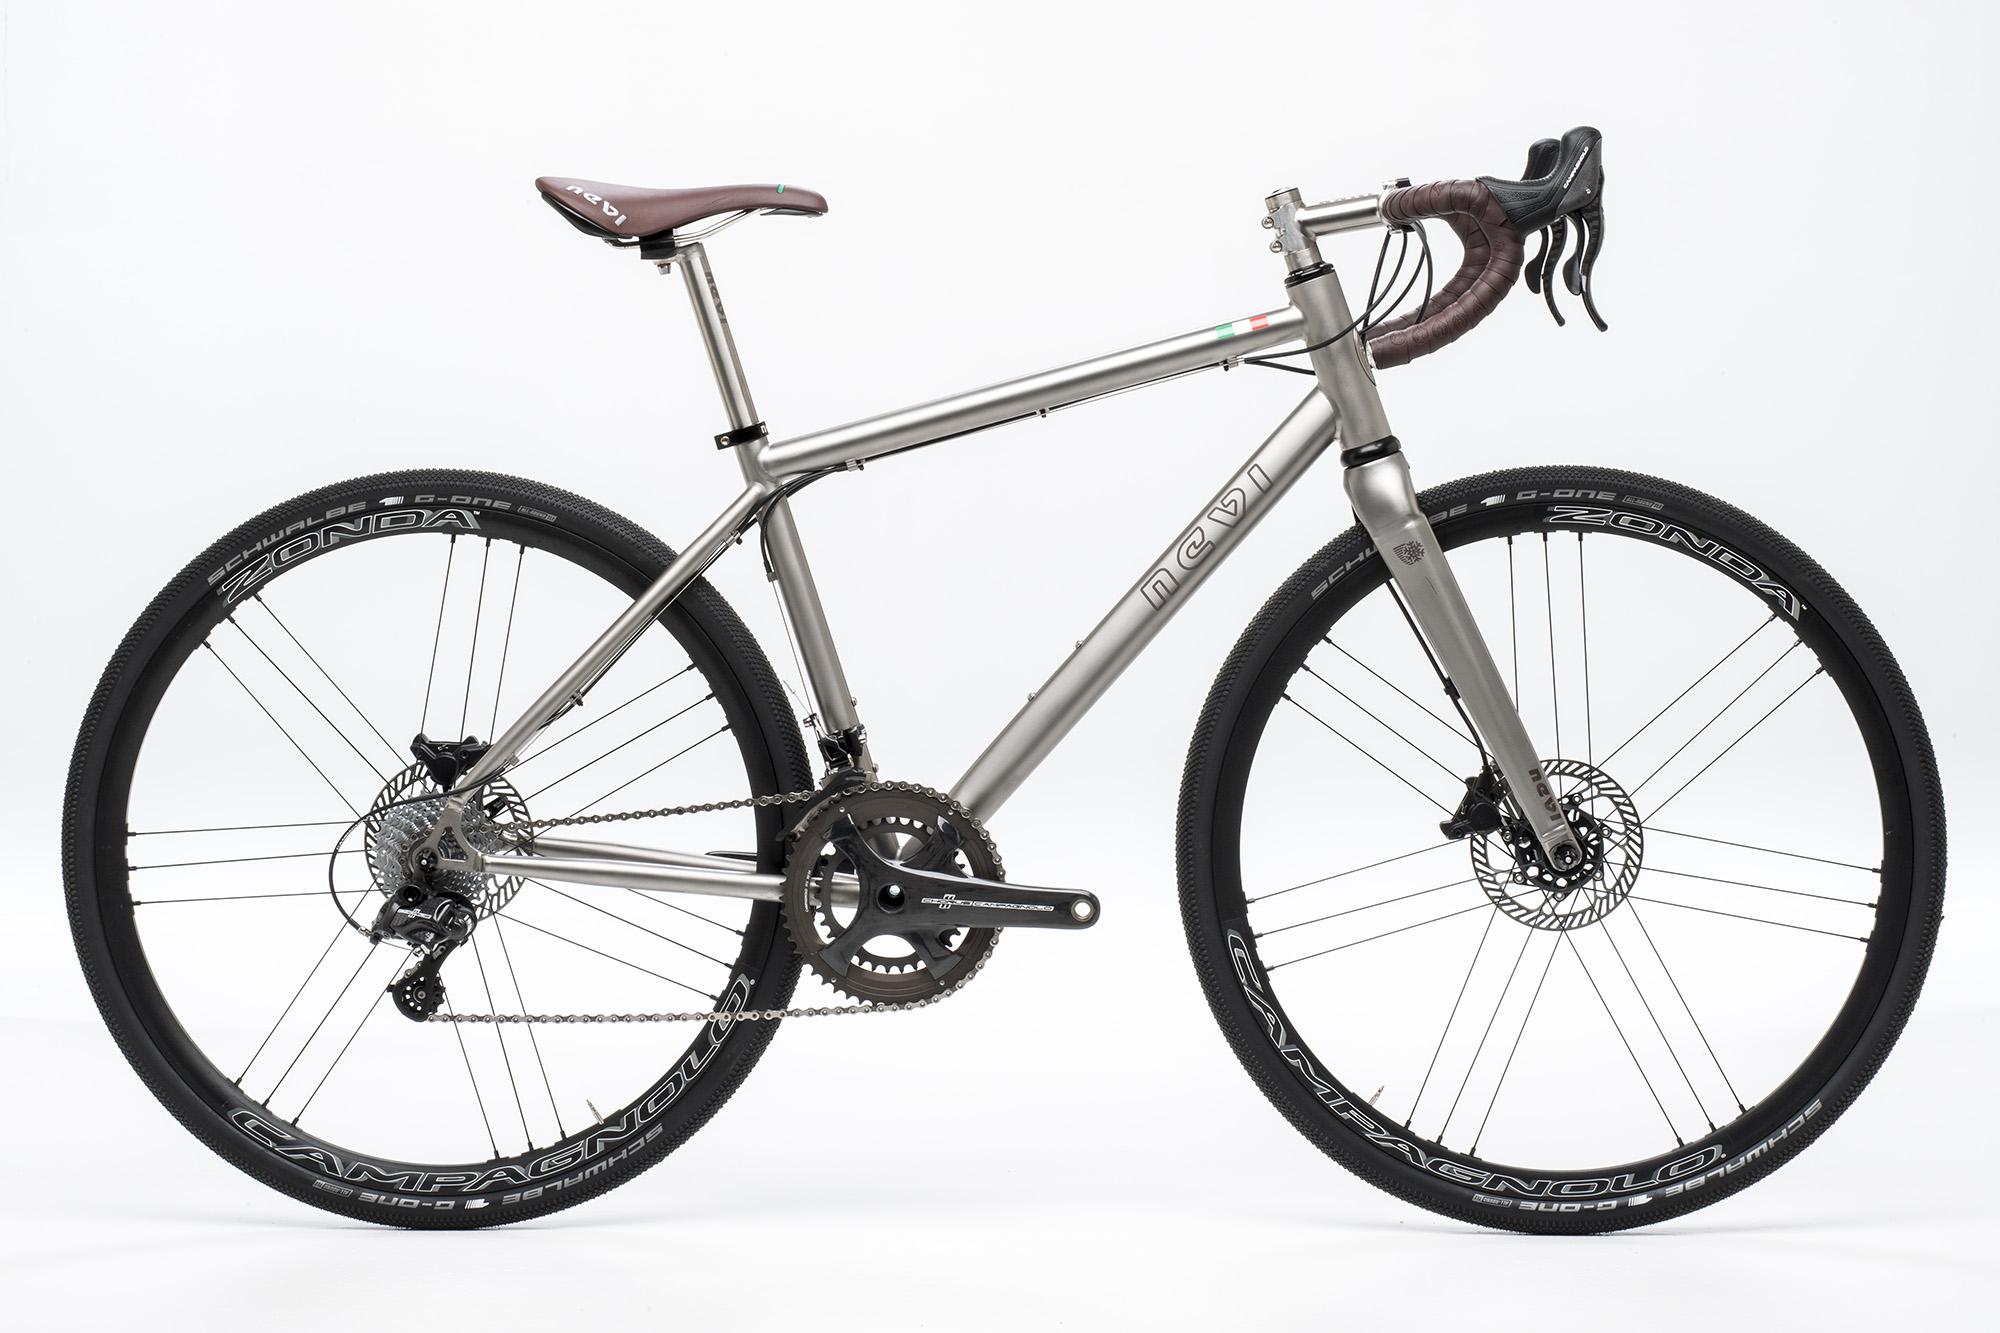 nevi titanium bikes gravel hand built titanium gravel disc frame 700 Oakley Outerwear review this item